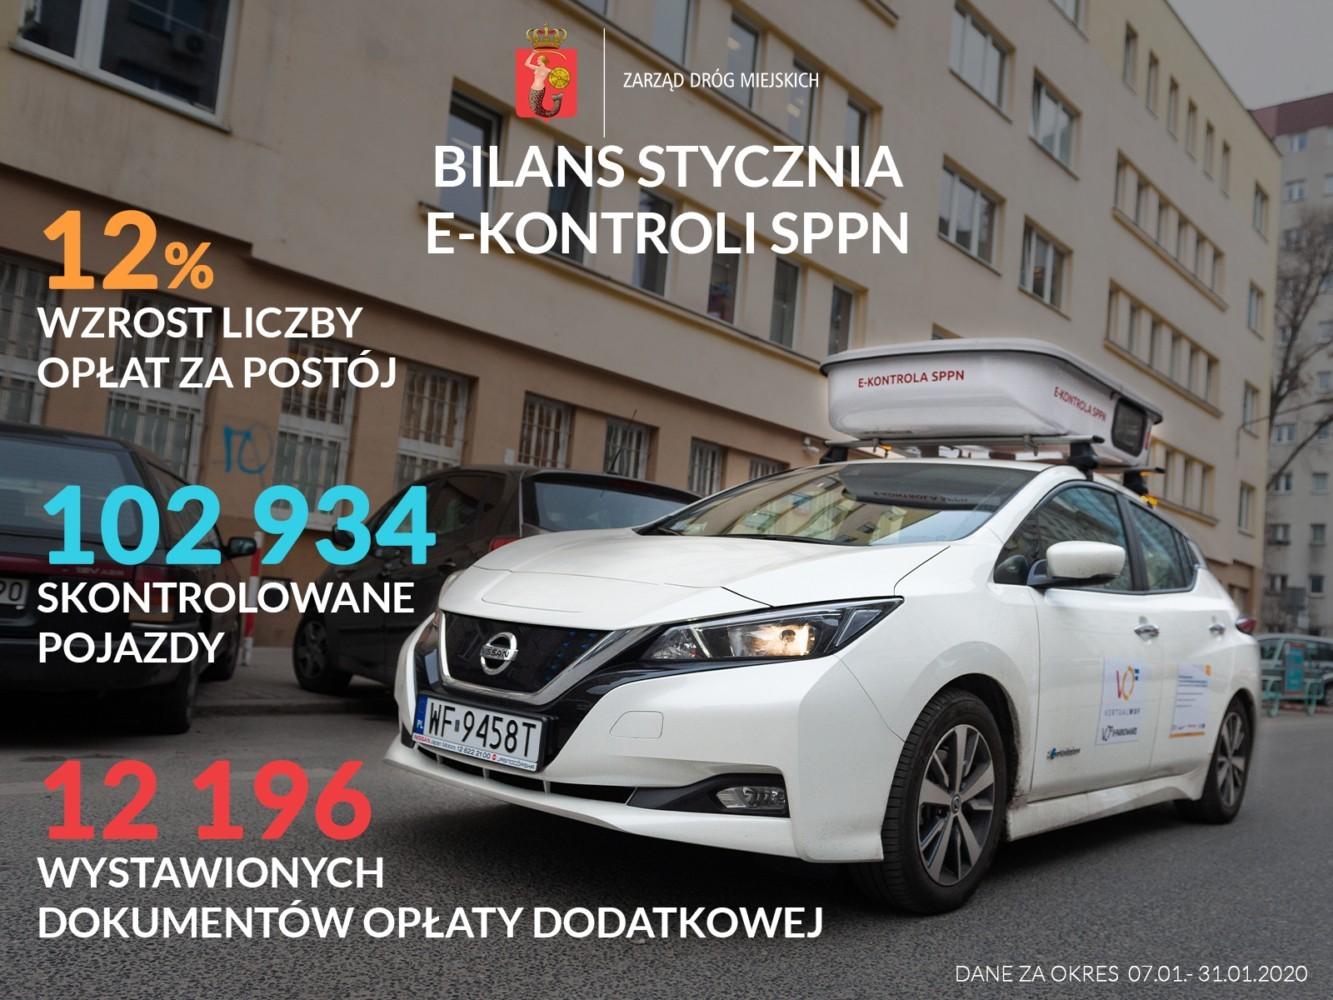 e-kontrola-infografika-styczen-2020-1333x1000